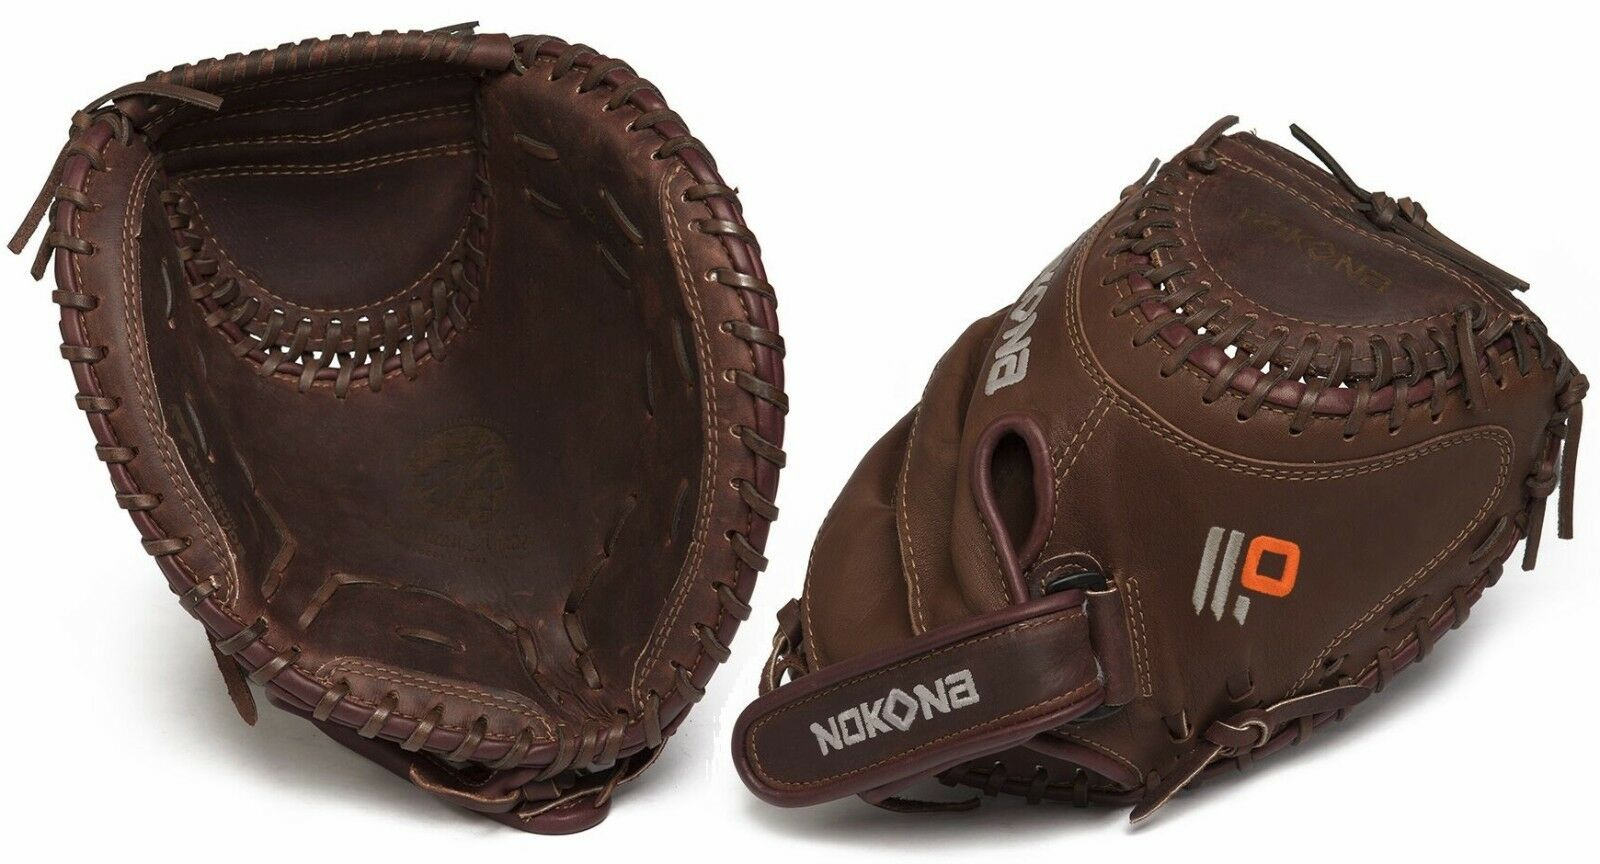 Nokona X2 Elite 32.5  Fastpitch catcher's Softbol Guante X2-V3250 Derecho Mano lanzador